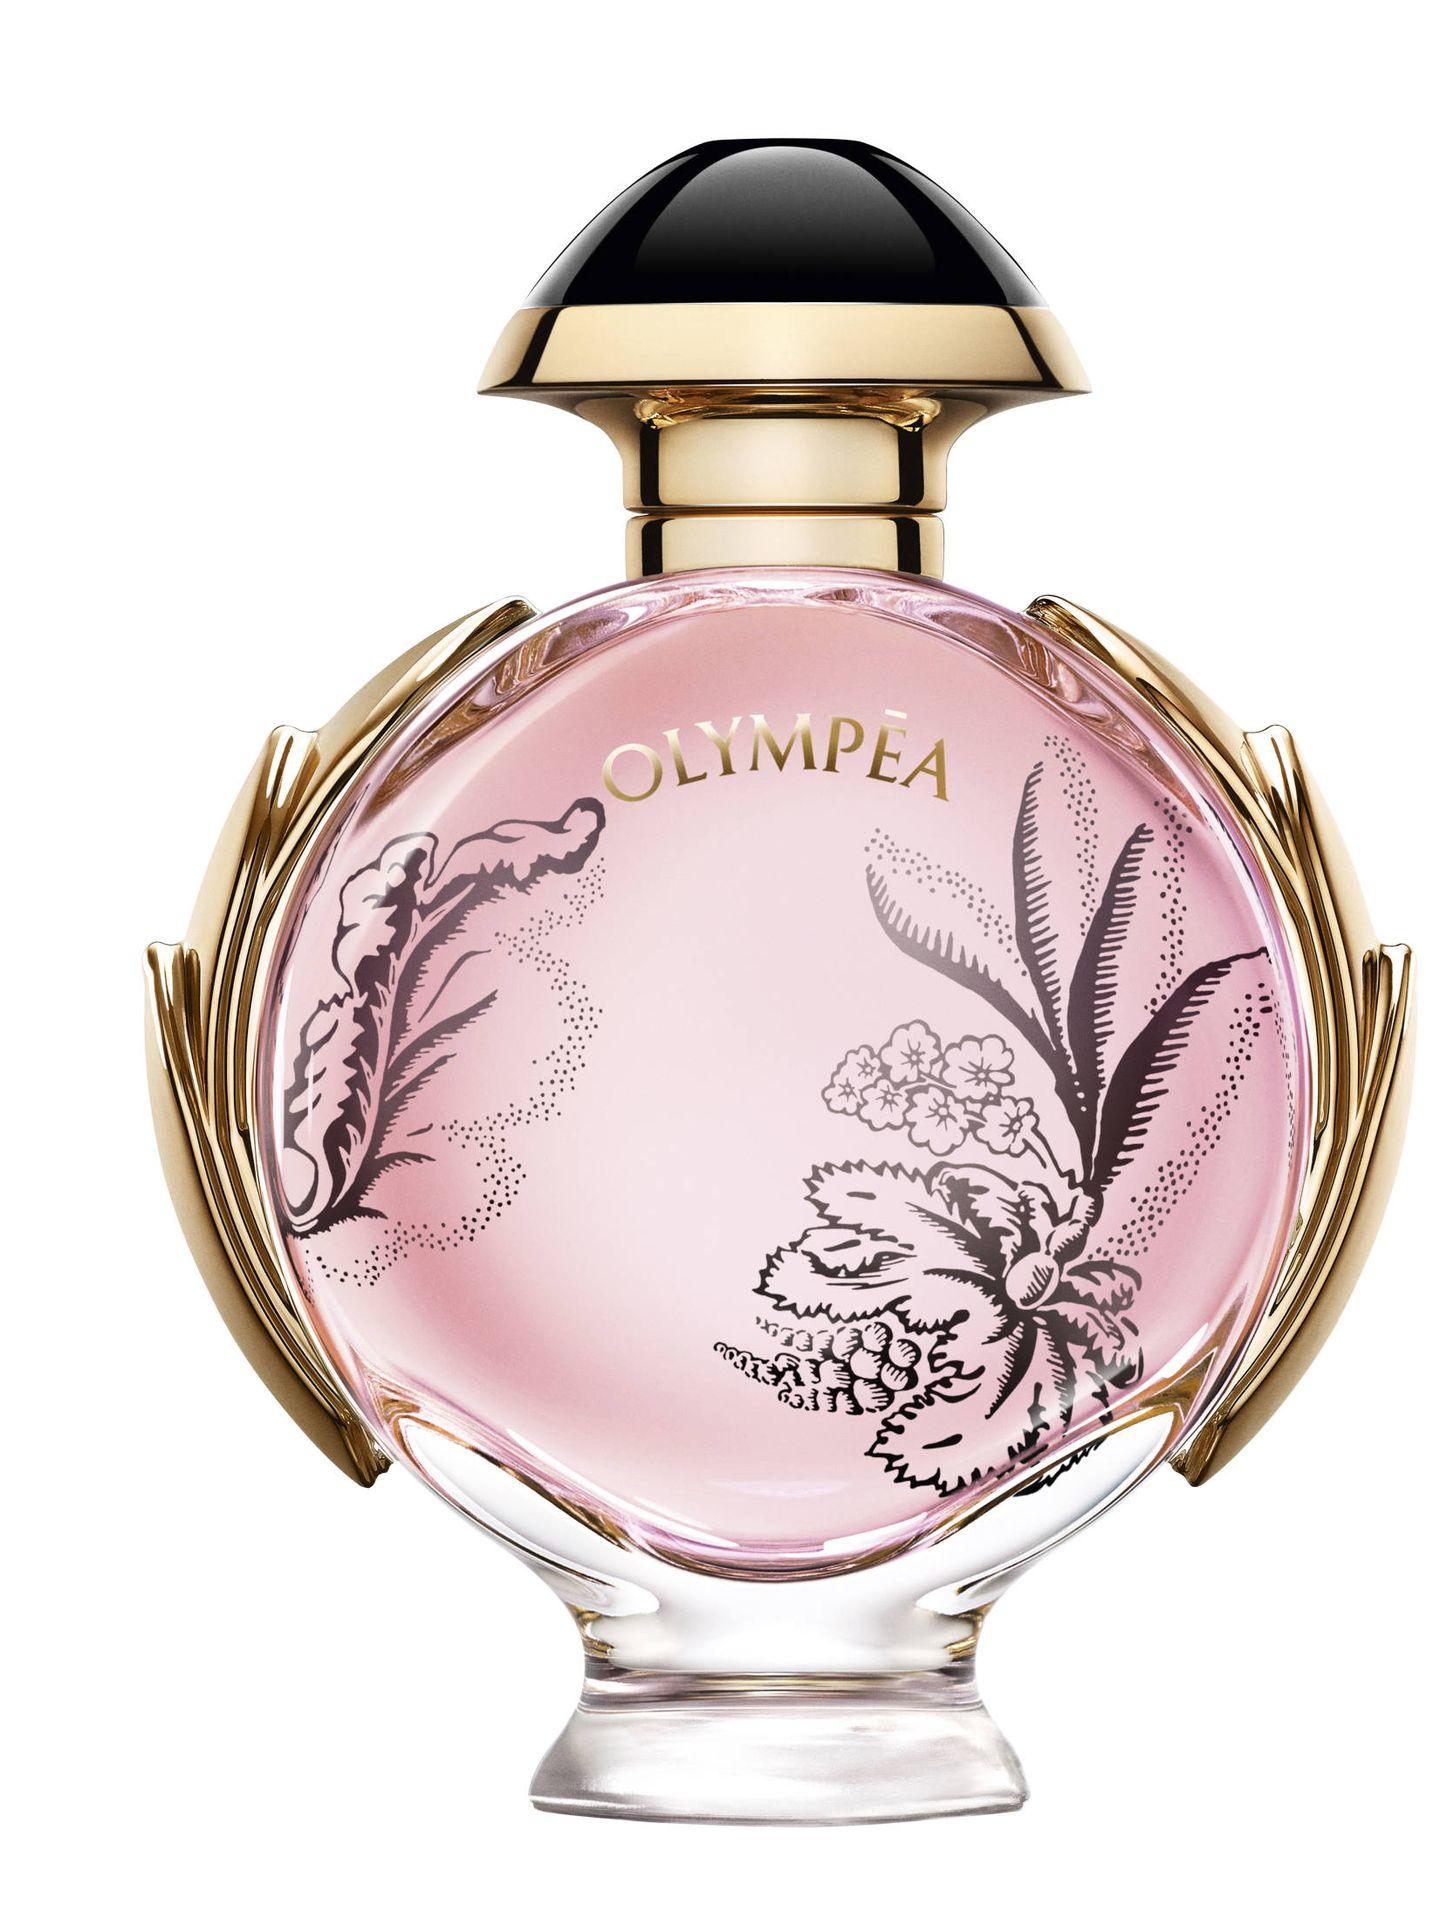 Olympéa Blossom, de Paco Rabanne.